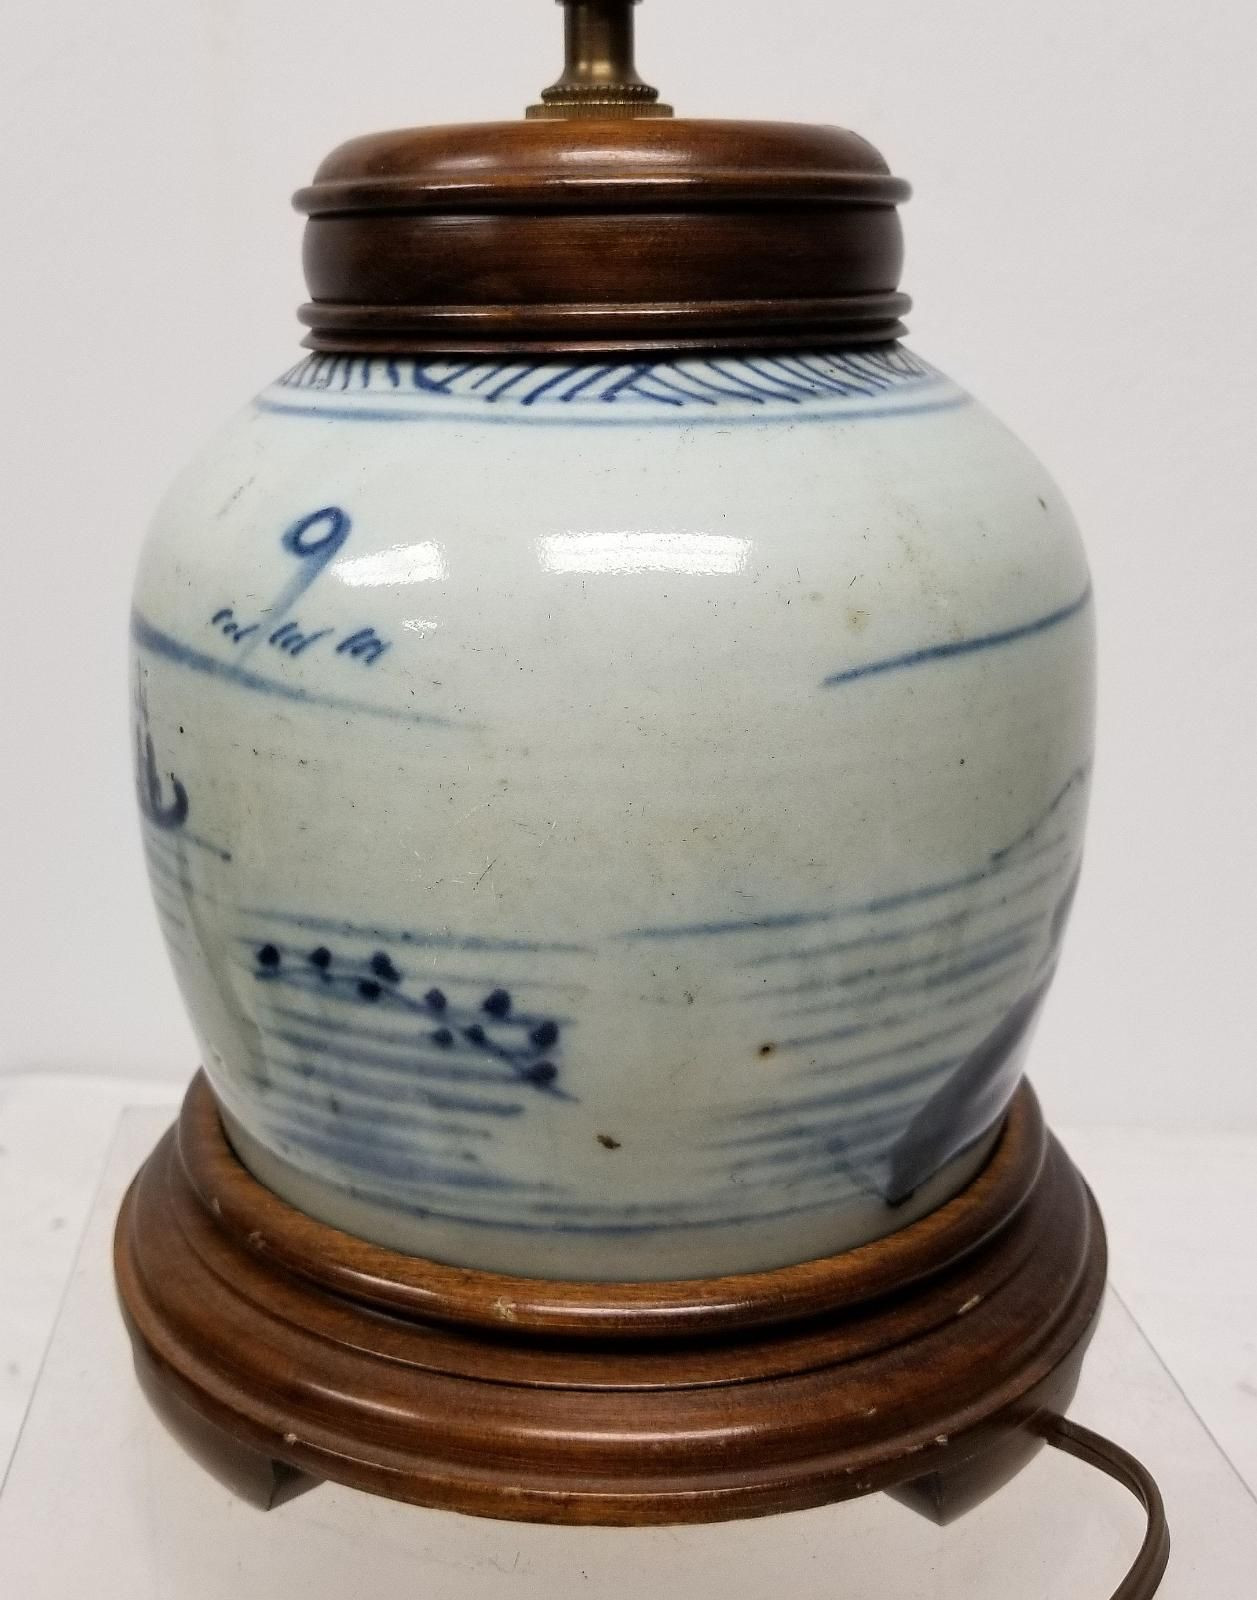 glass ginger vase of 31 ginger jar vase the weekly world in antique vintage chinese underglaze blue and white ginger jar lamp